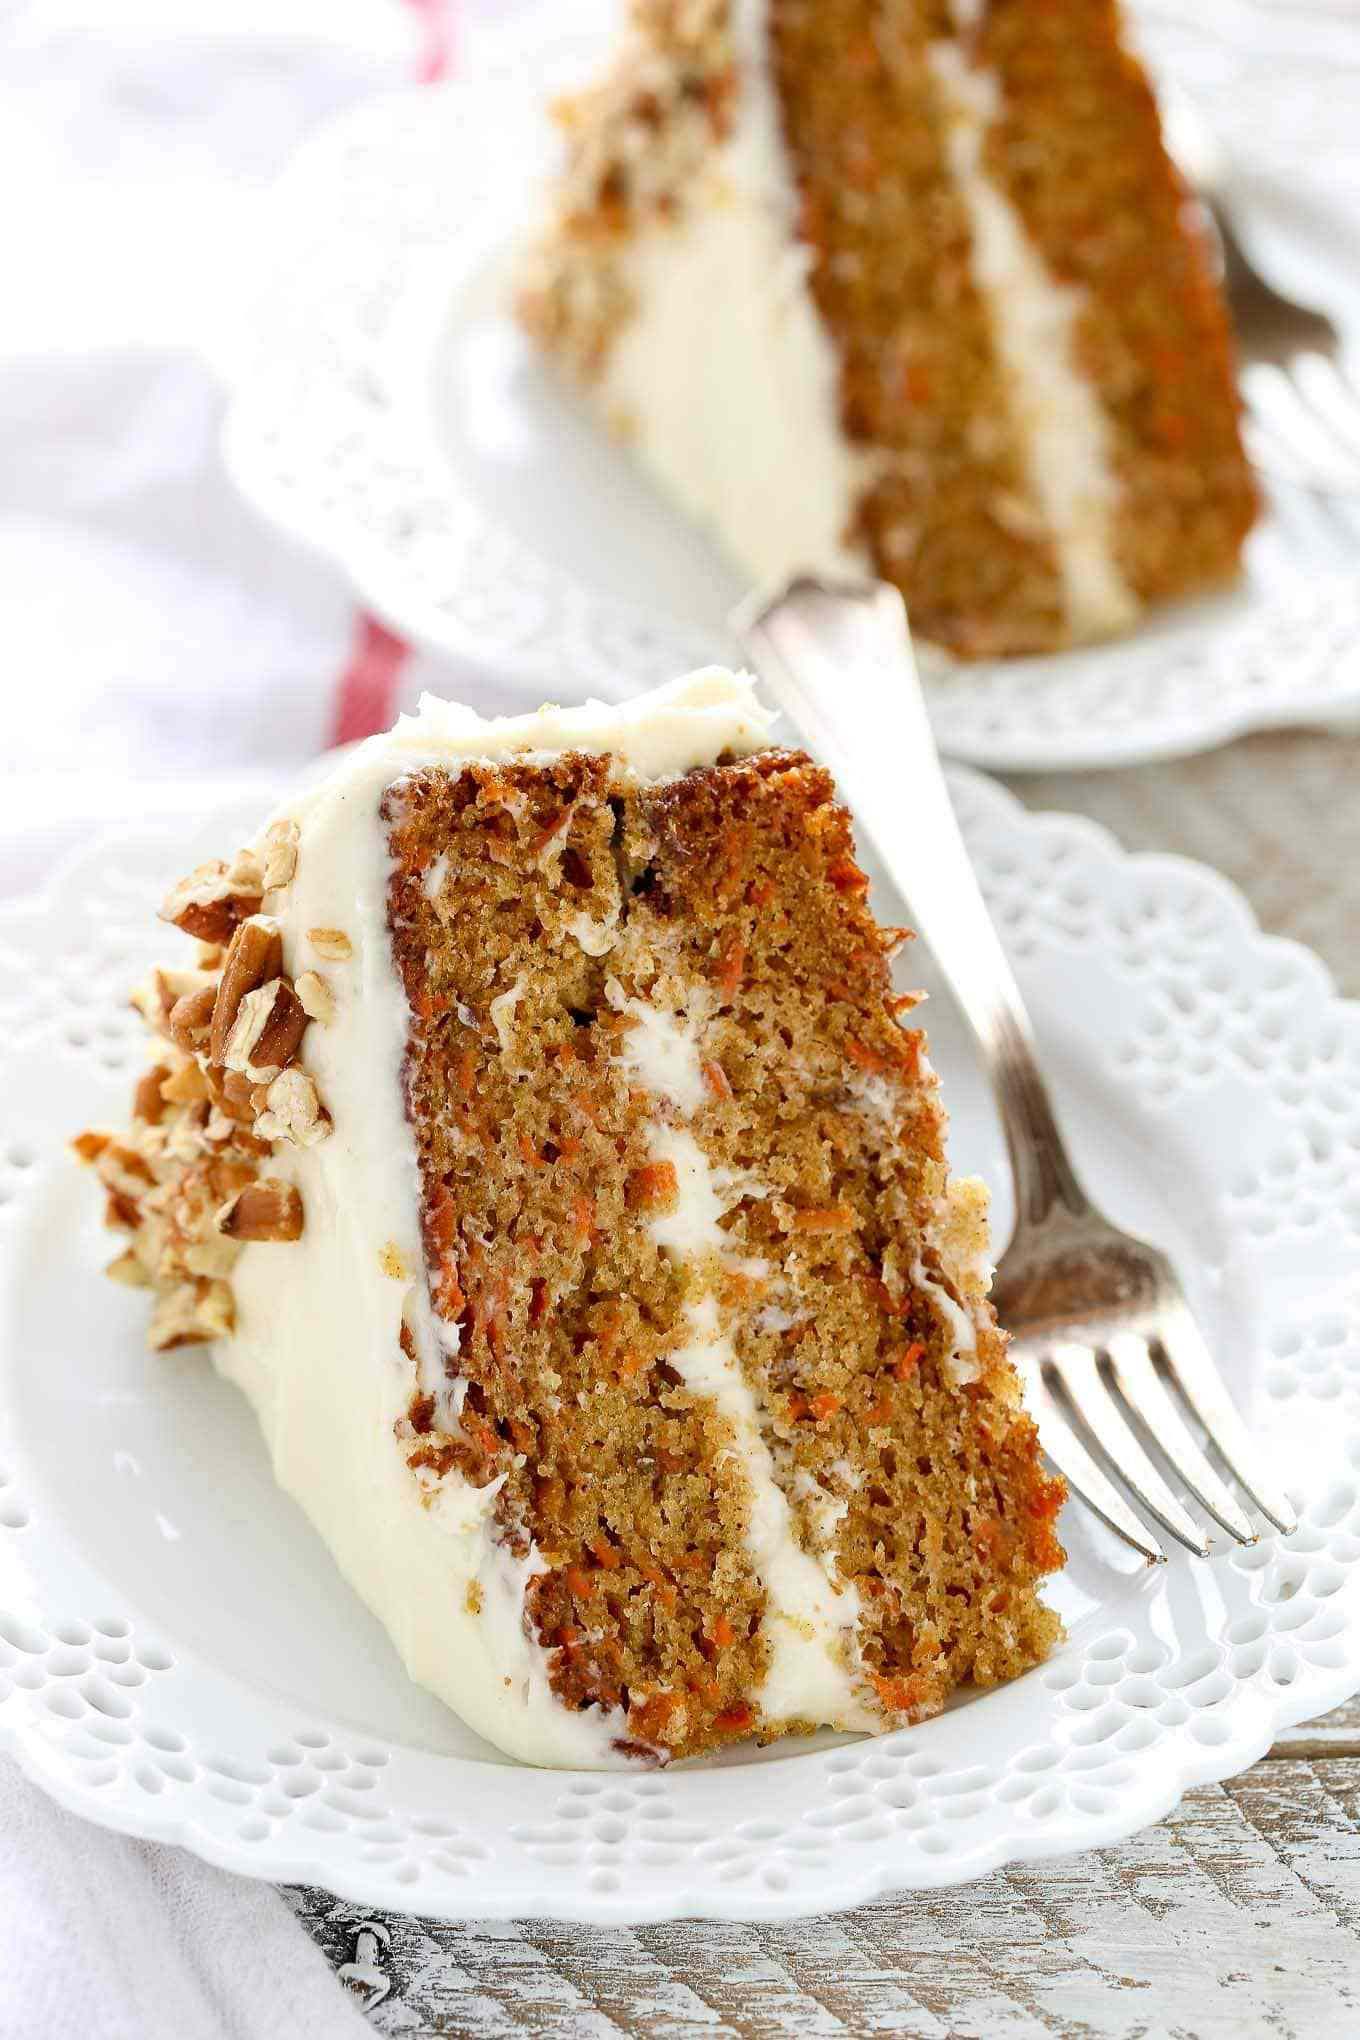 Best Carrot Cake  The BEST Carrot Cake Recipe